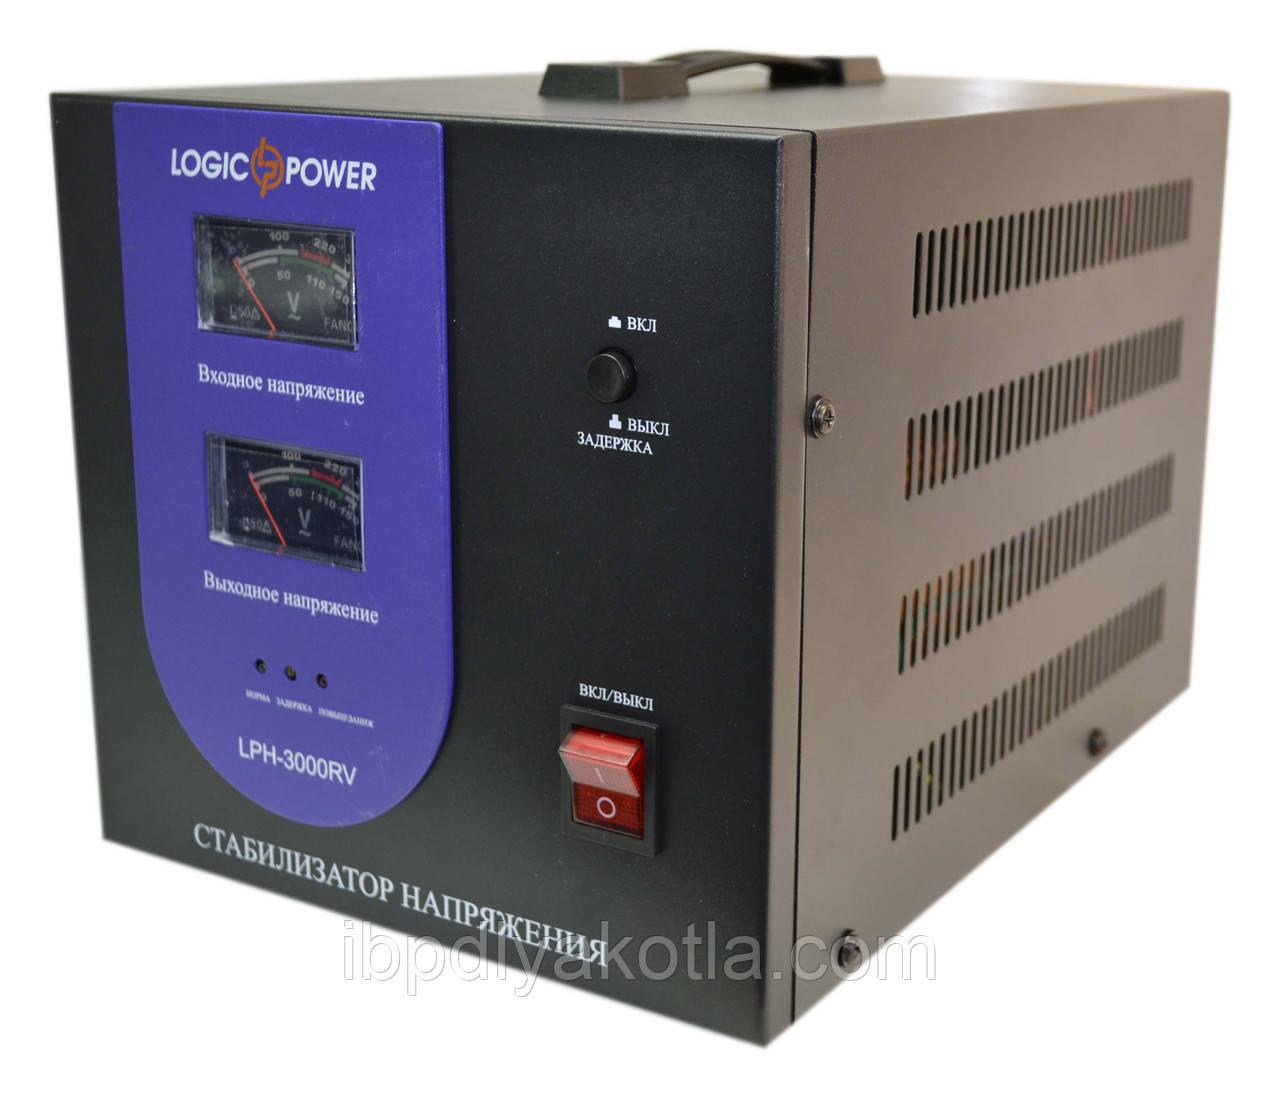 Стабилизатор напряжения Logicpower LPH-3000RV 2100Вт